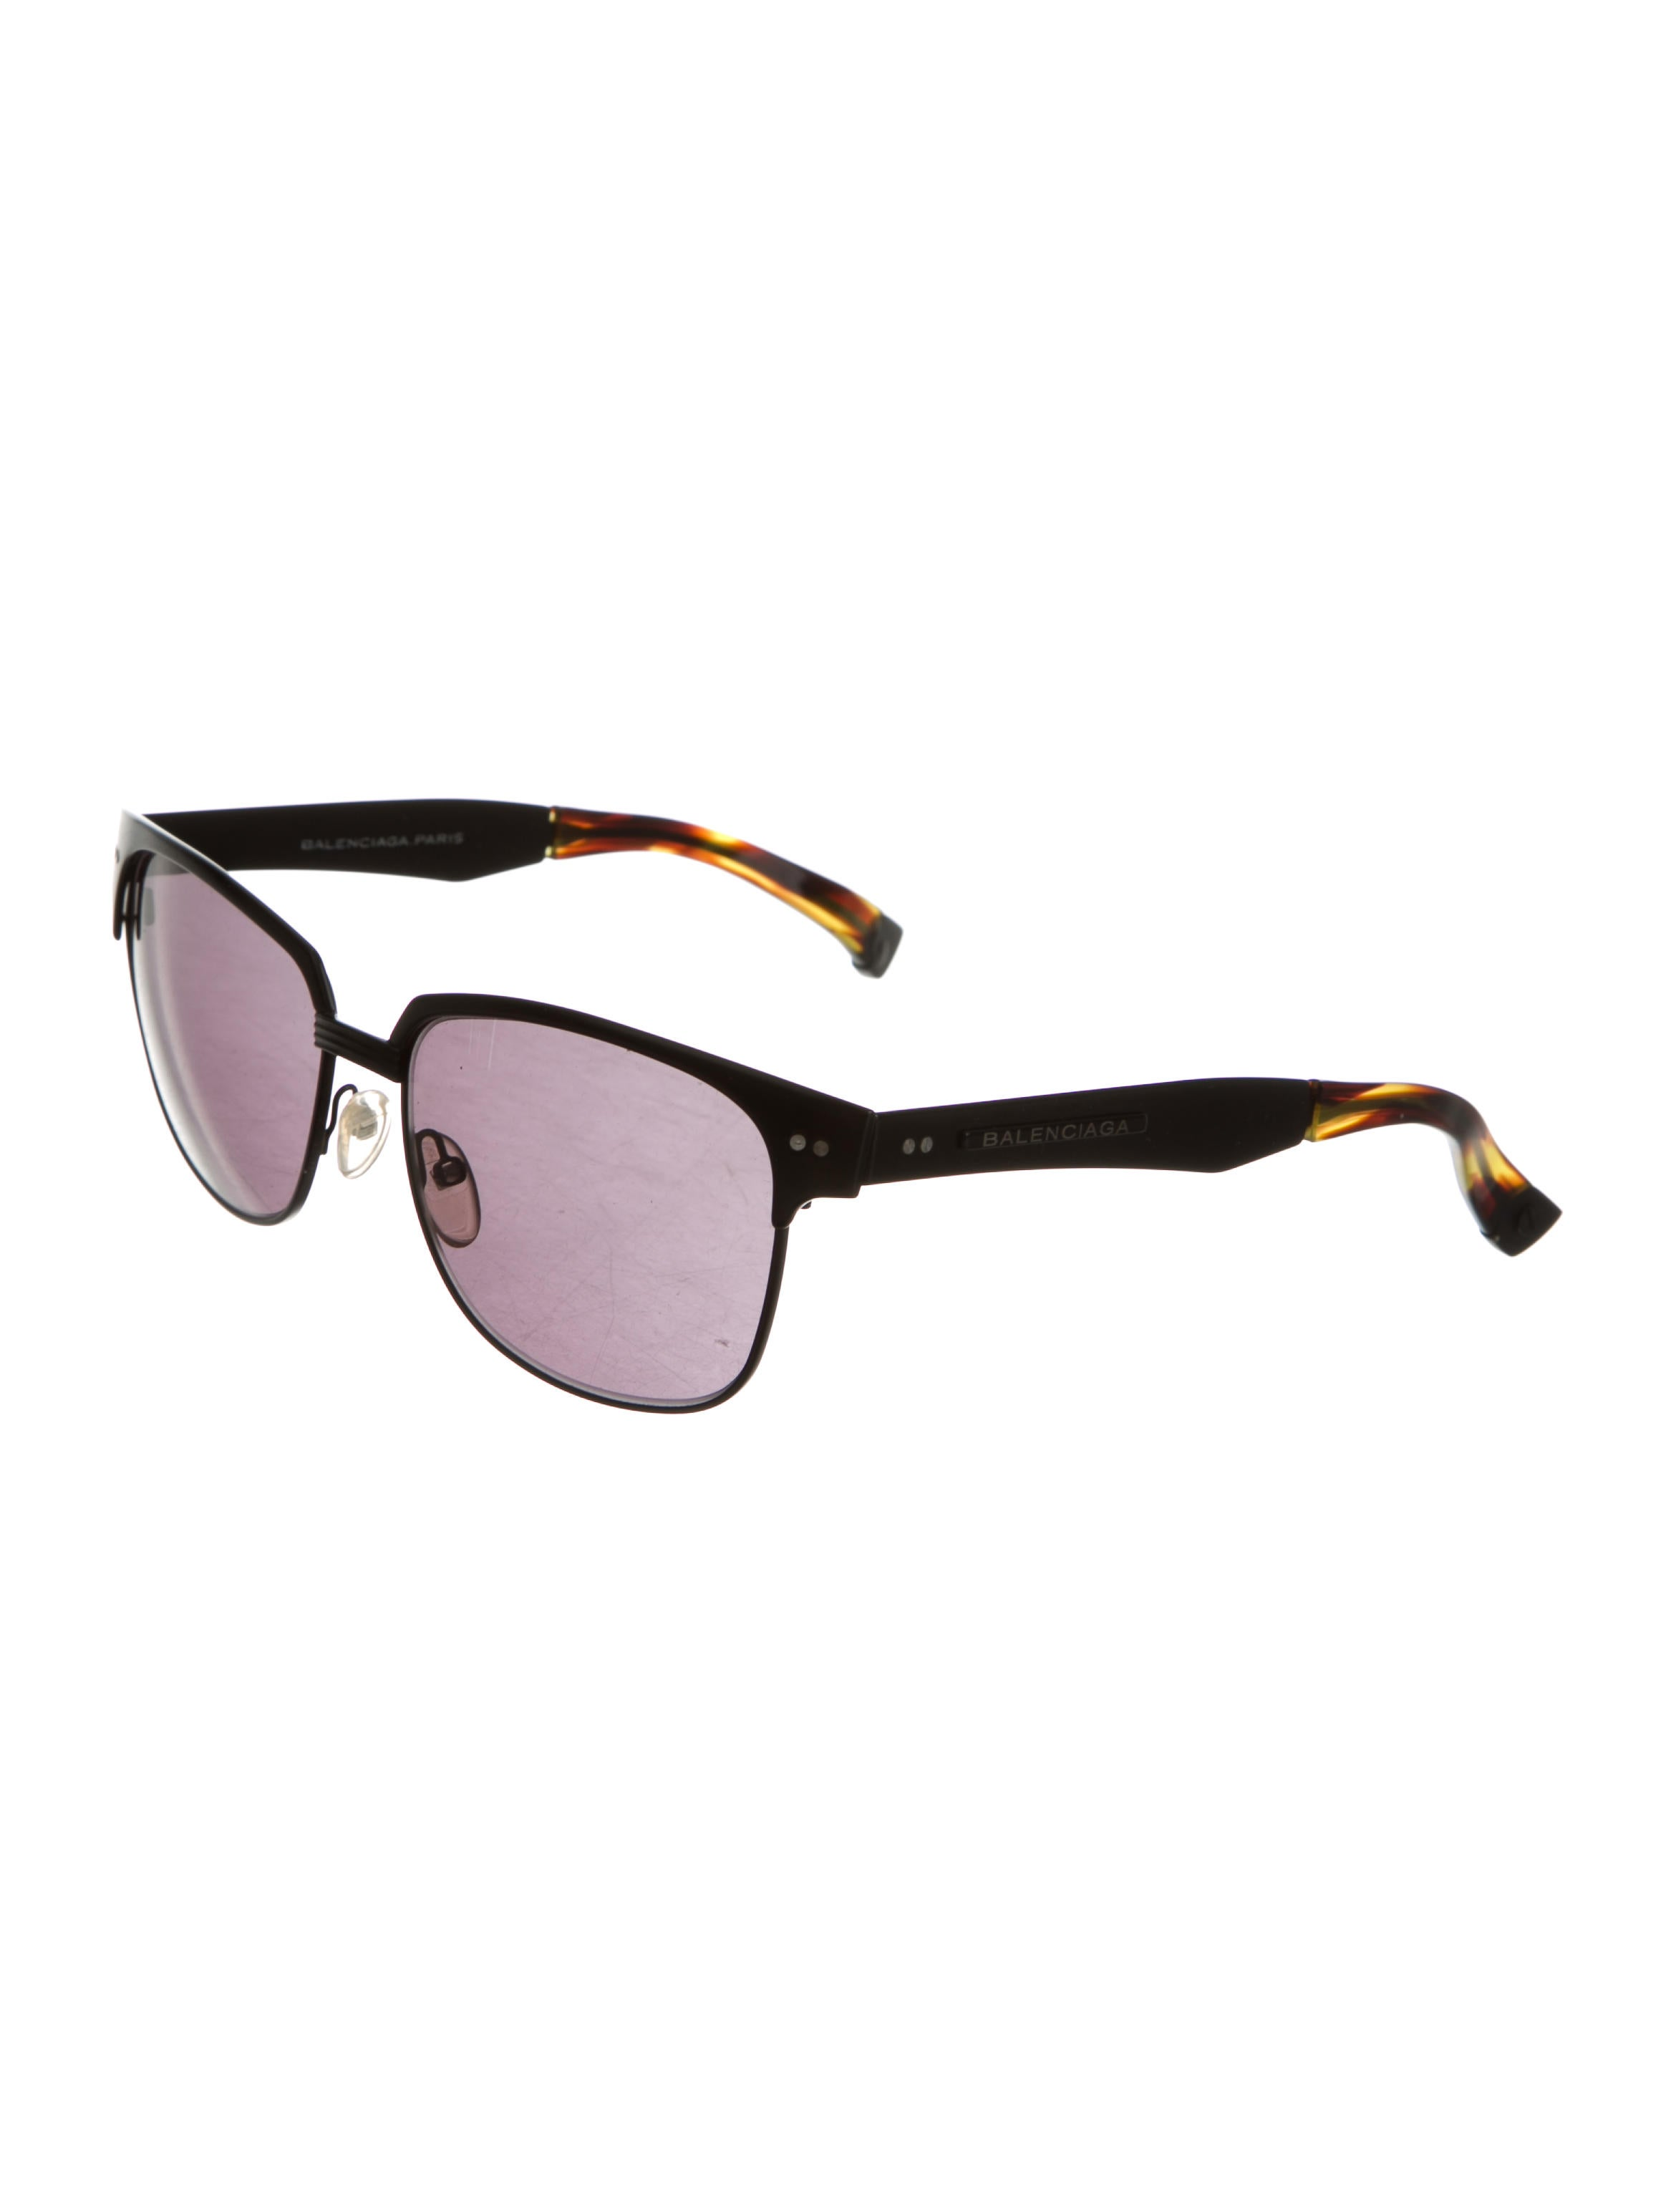 balenciaga resin tinted lens sunglasses accessories